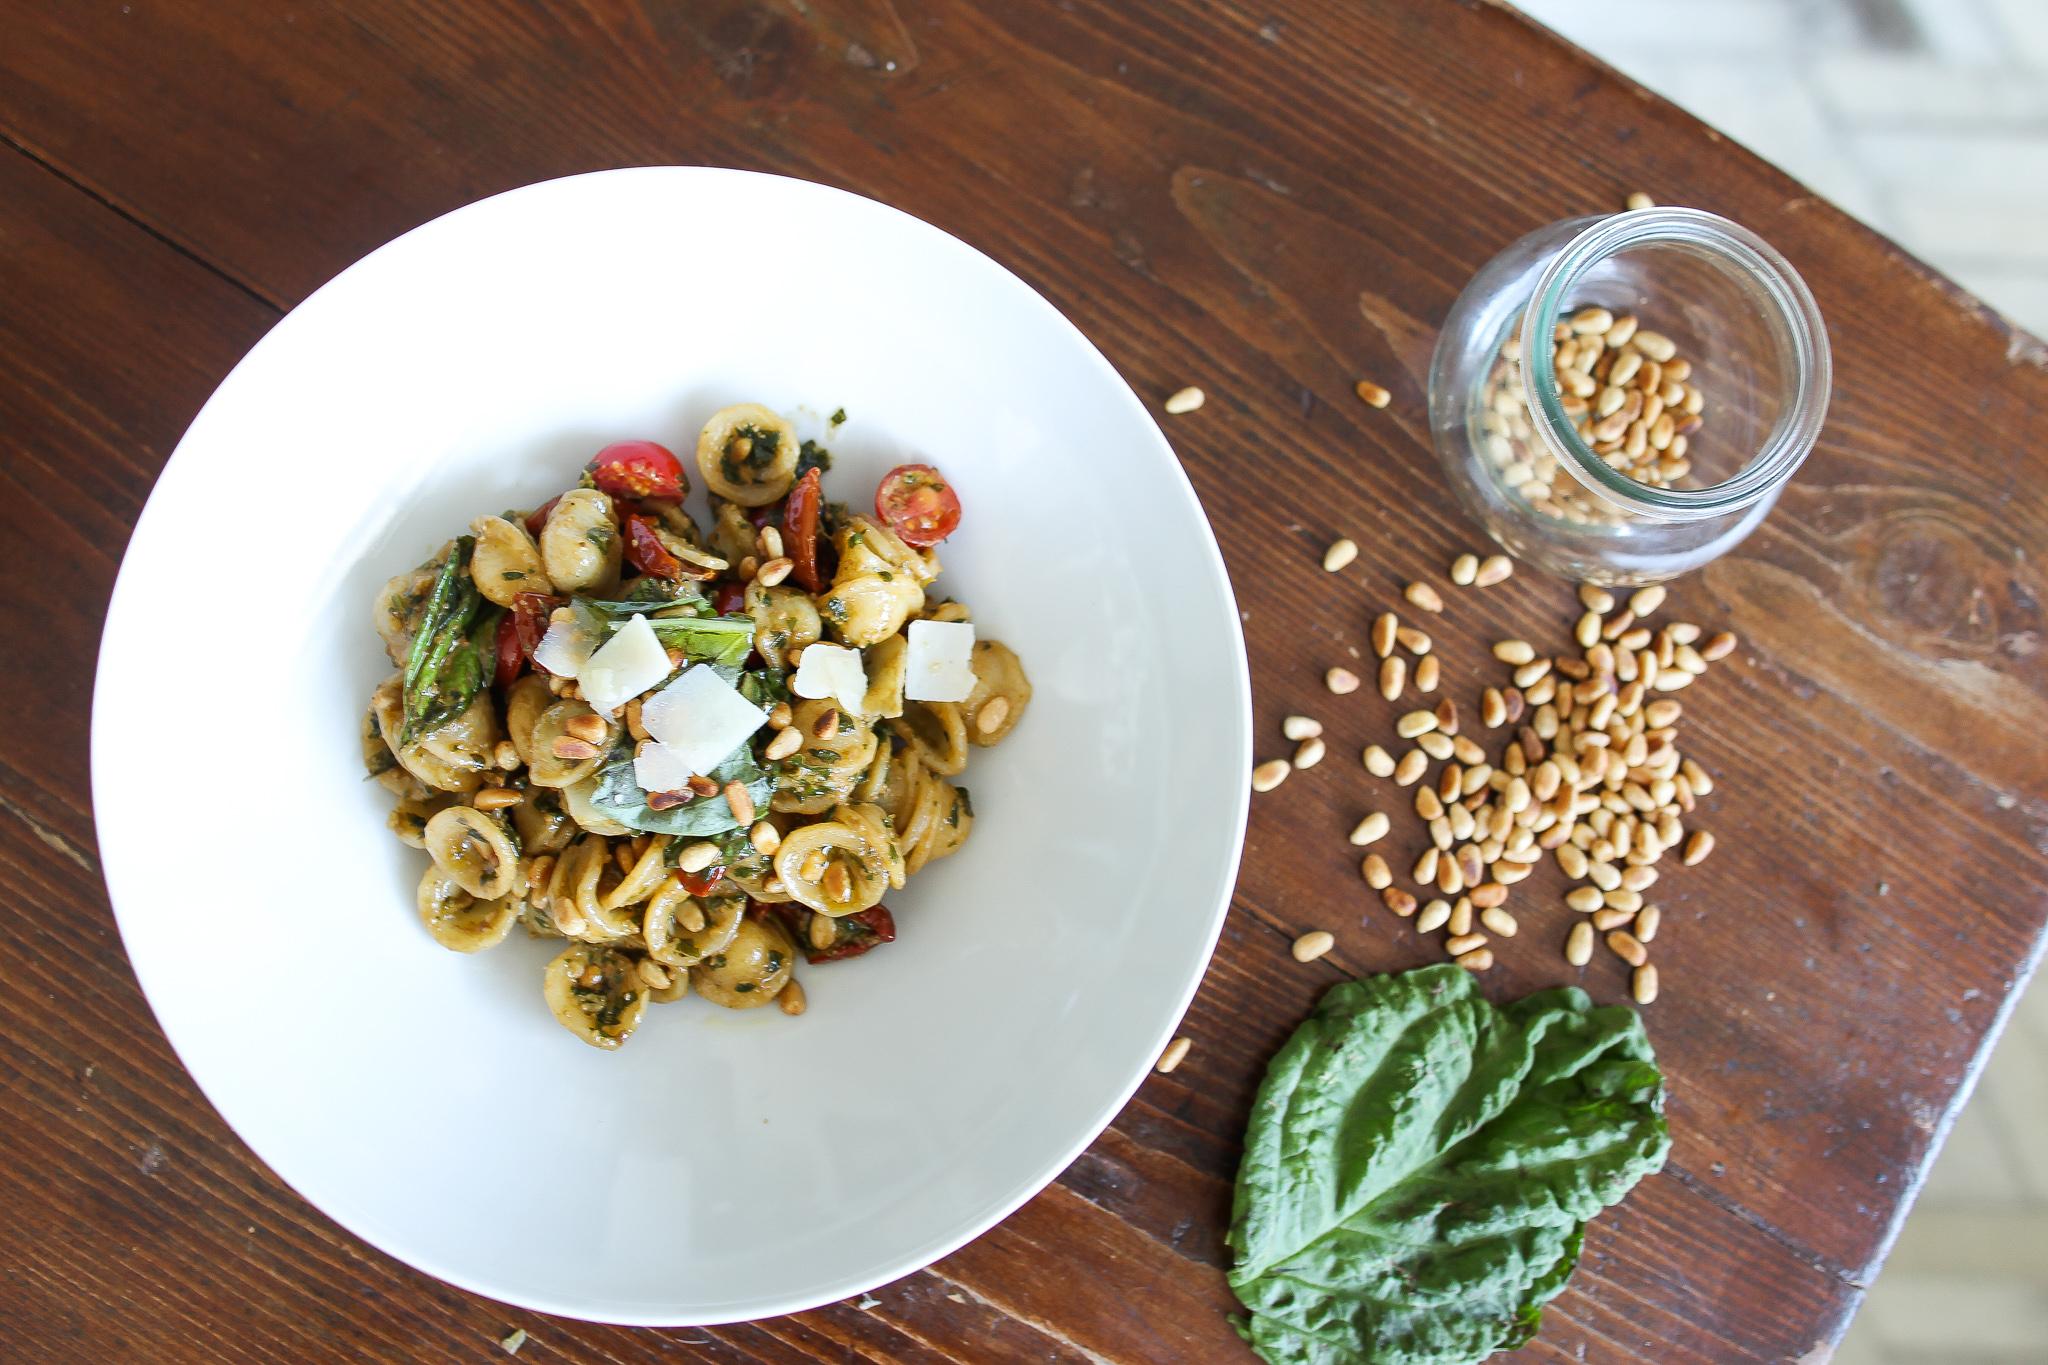 Orecchiette with pesto and sundried tomatoes